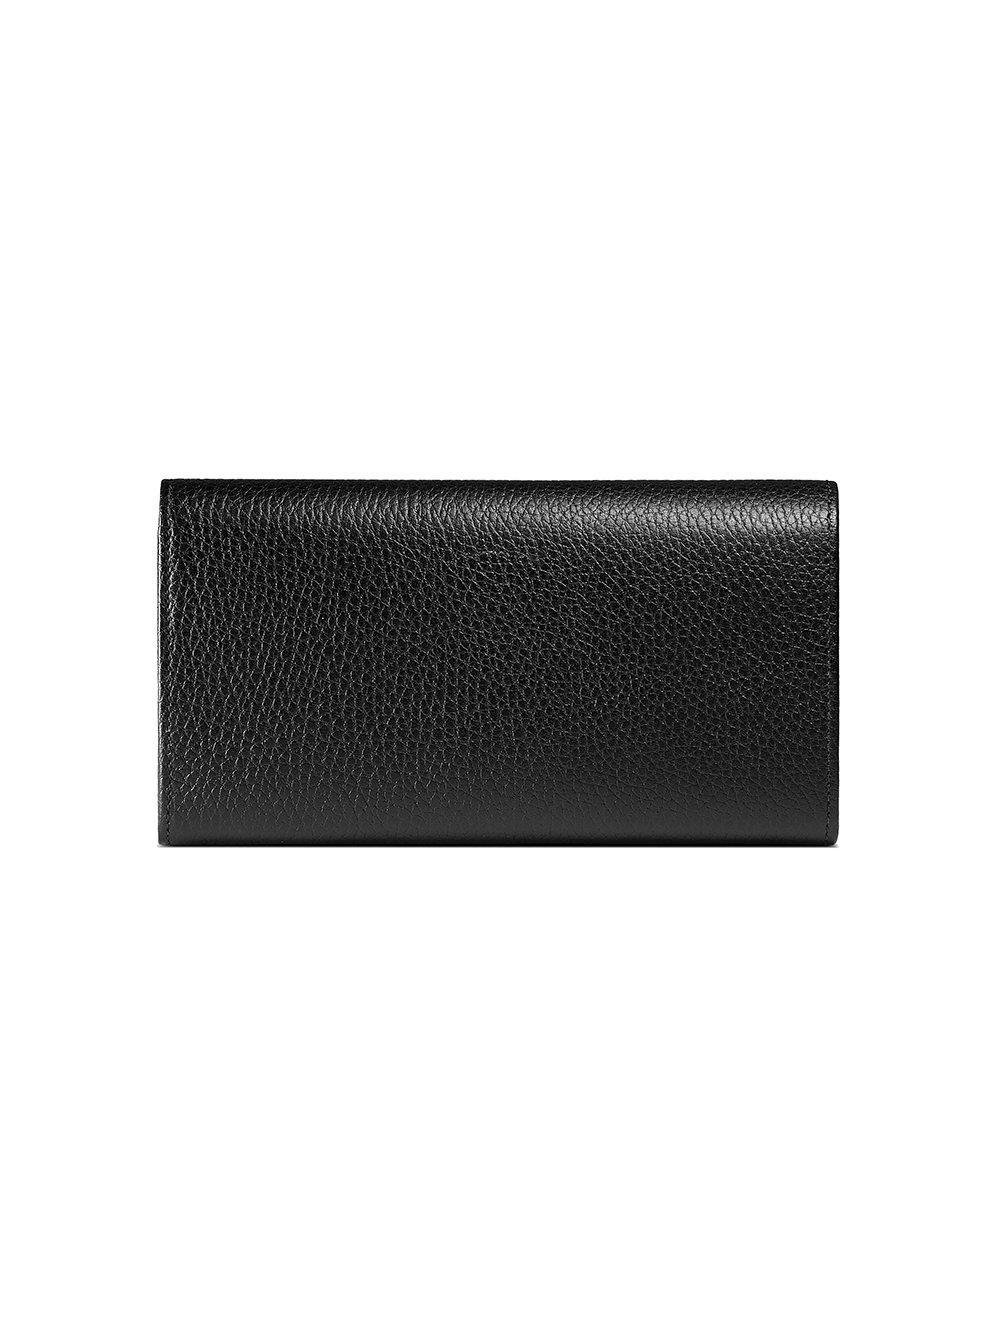 cab8f9be11c6a2 Gucci - Black Farfalla Leather Continental Wallet - Lyst. View fullscreen